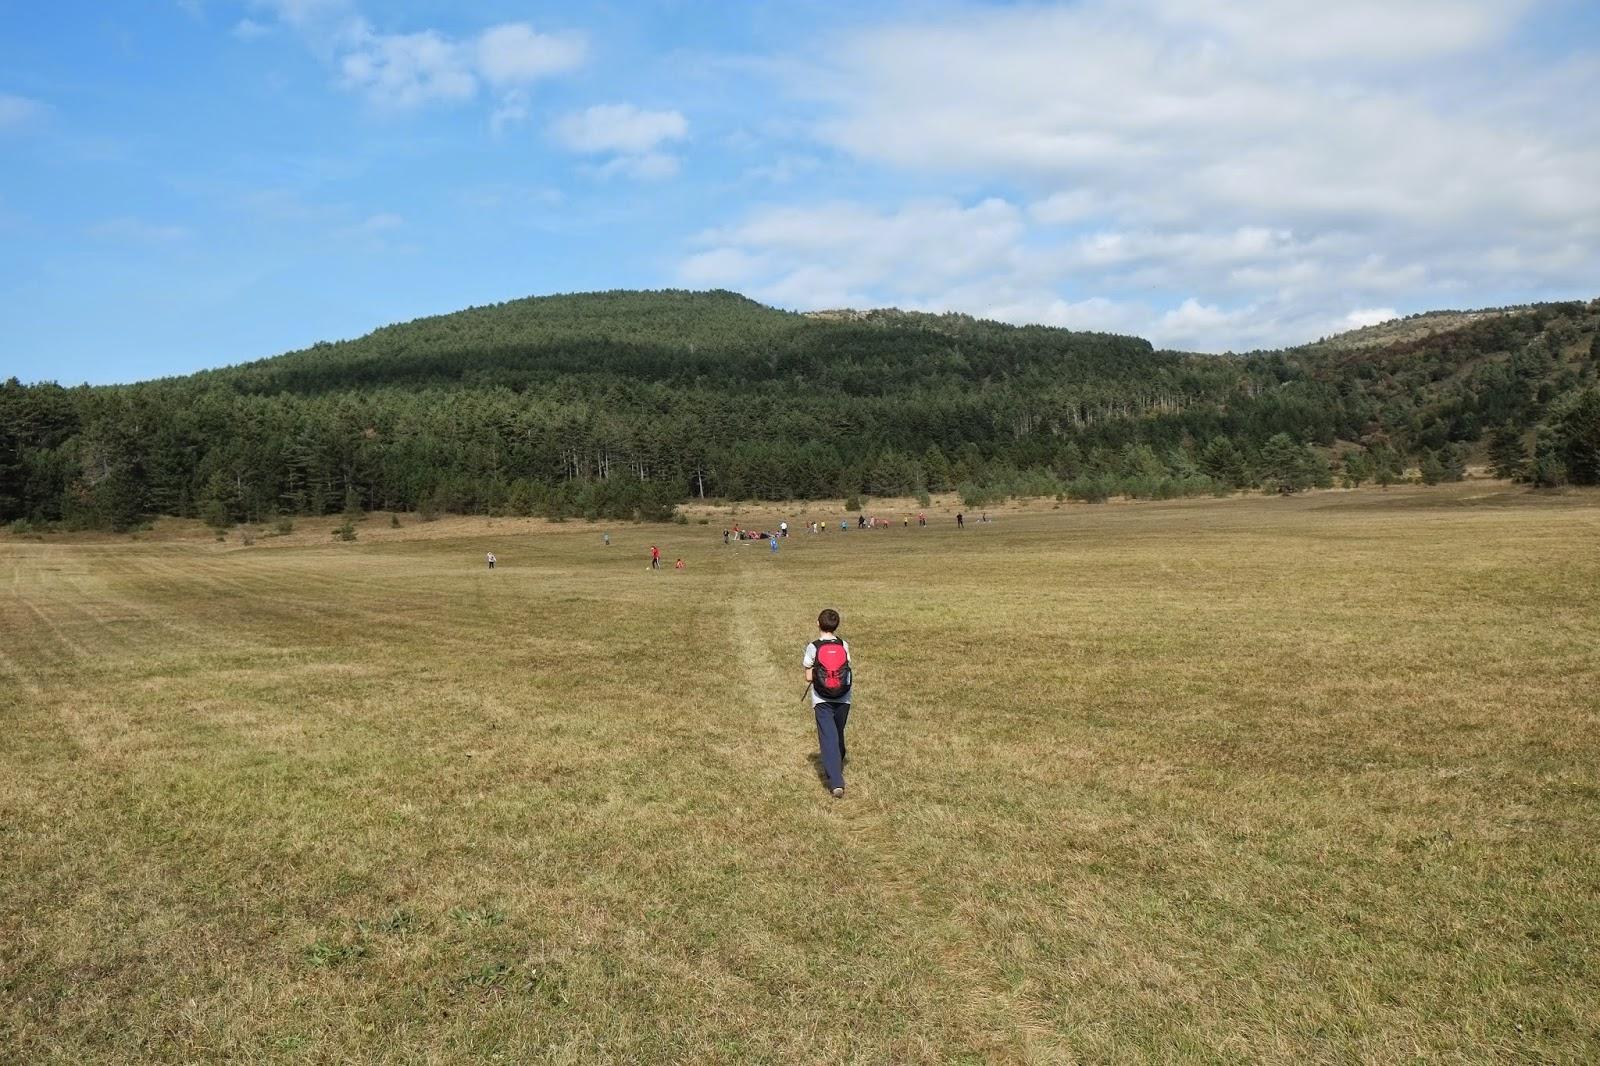 Pohod na Kozlek, Kozlek, 11.10.2014 - DSCF1189.JPG